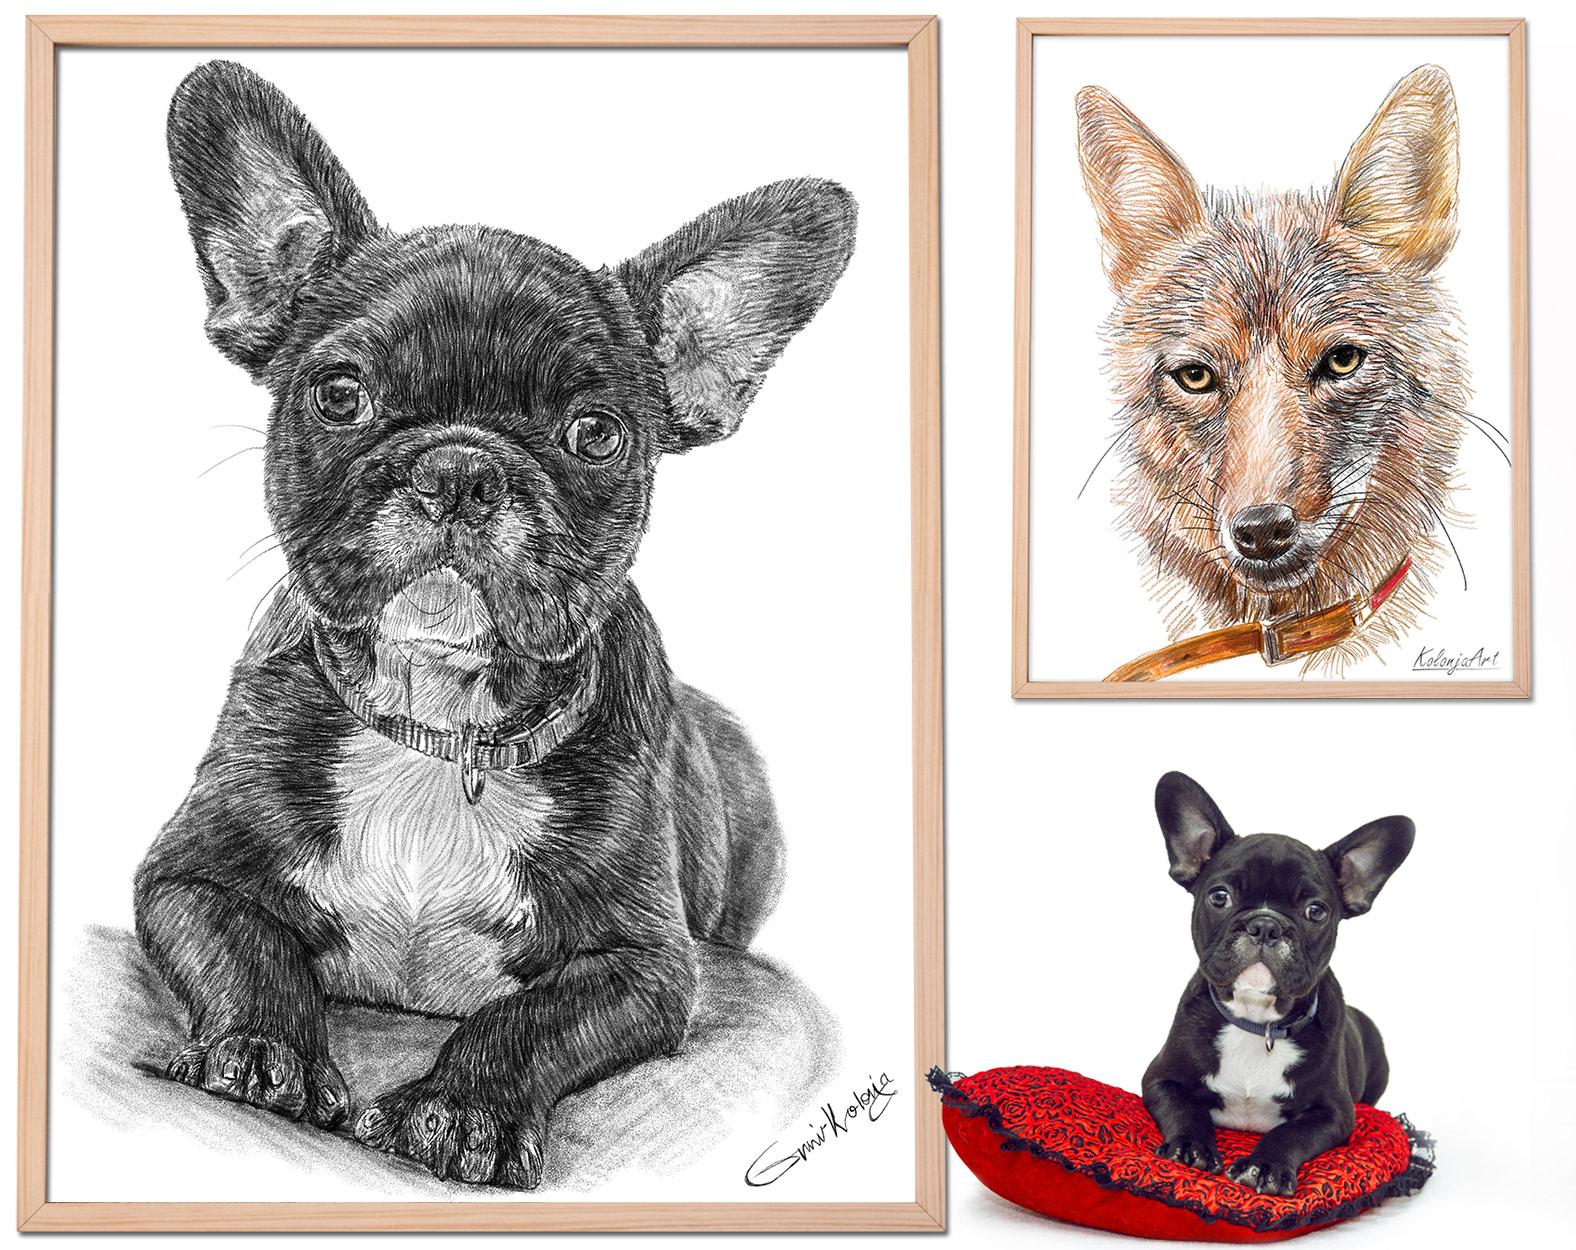 Digital Art,Drawing,Editorial Design